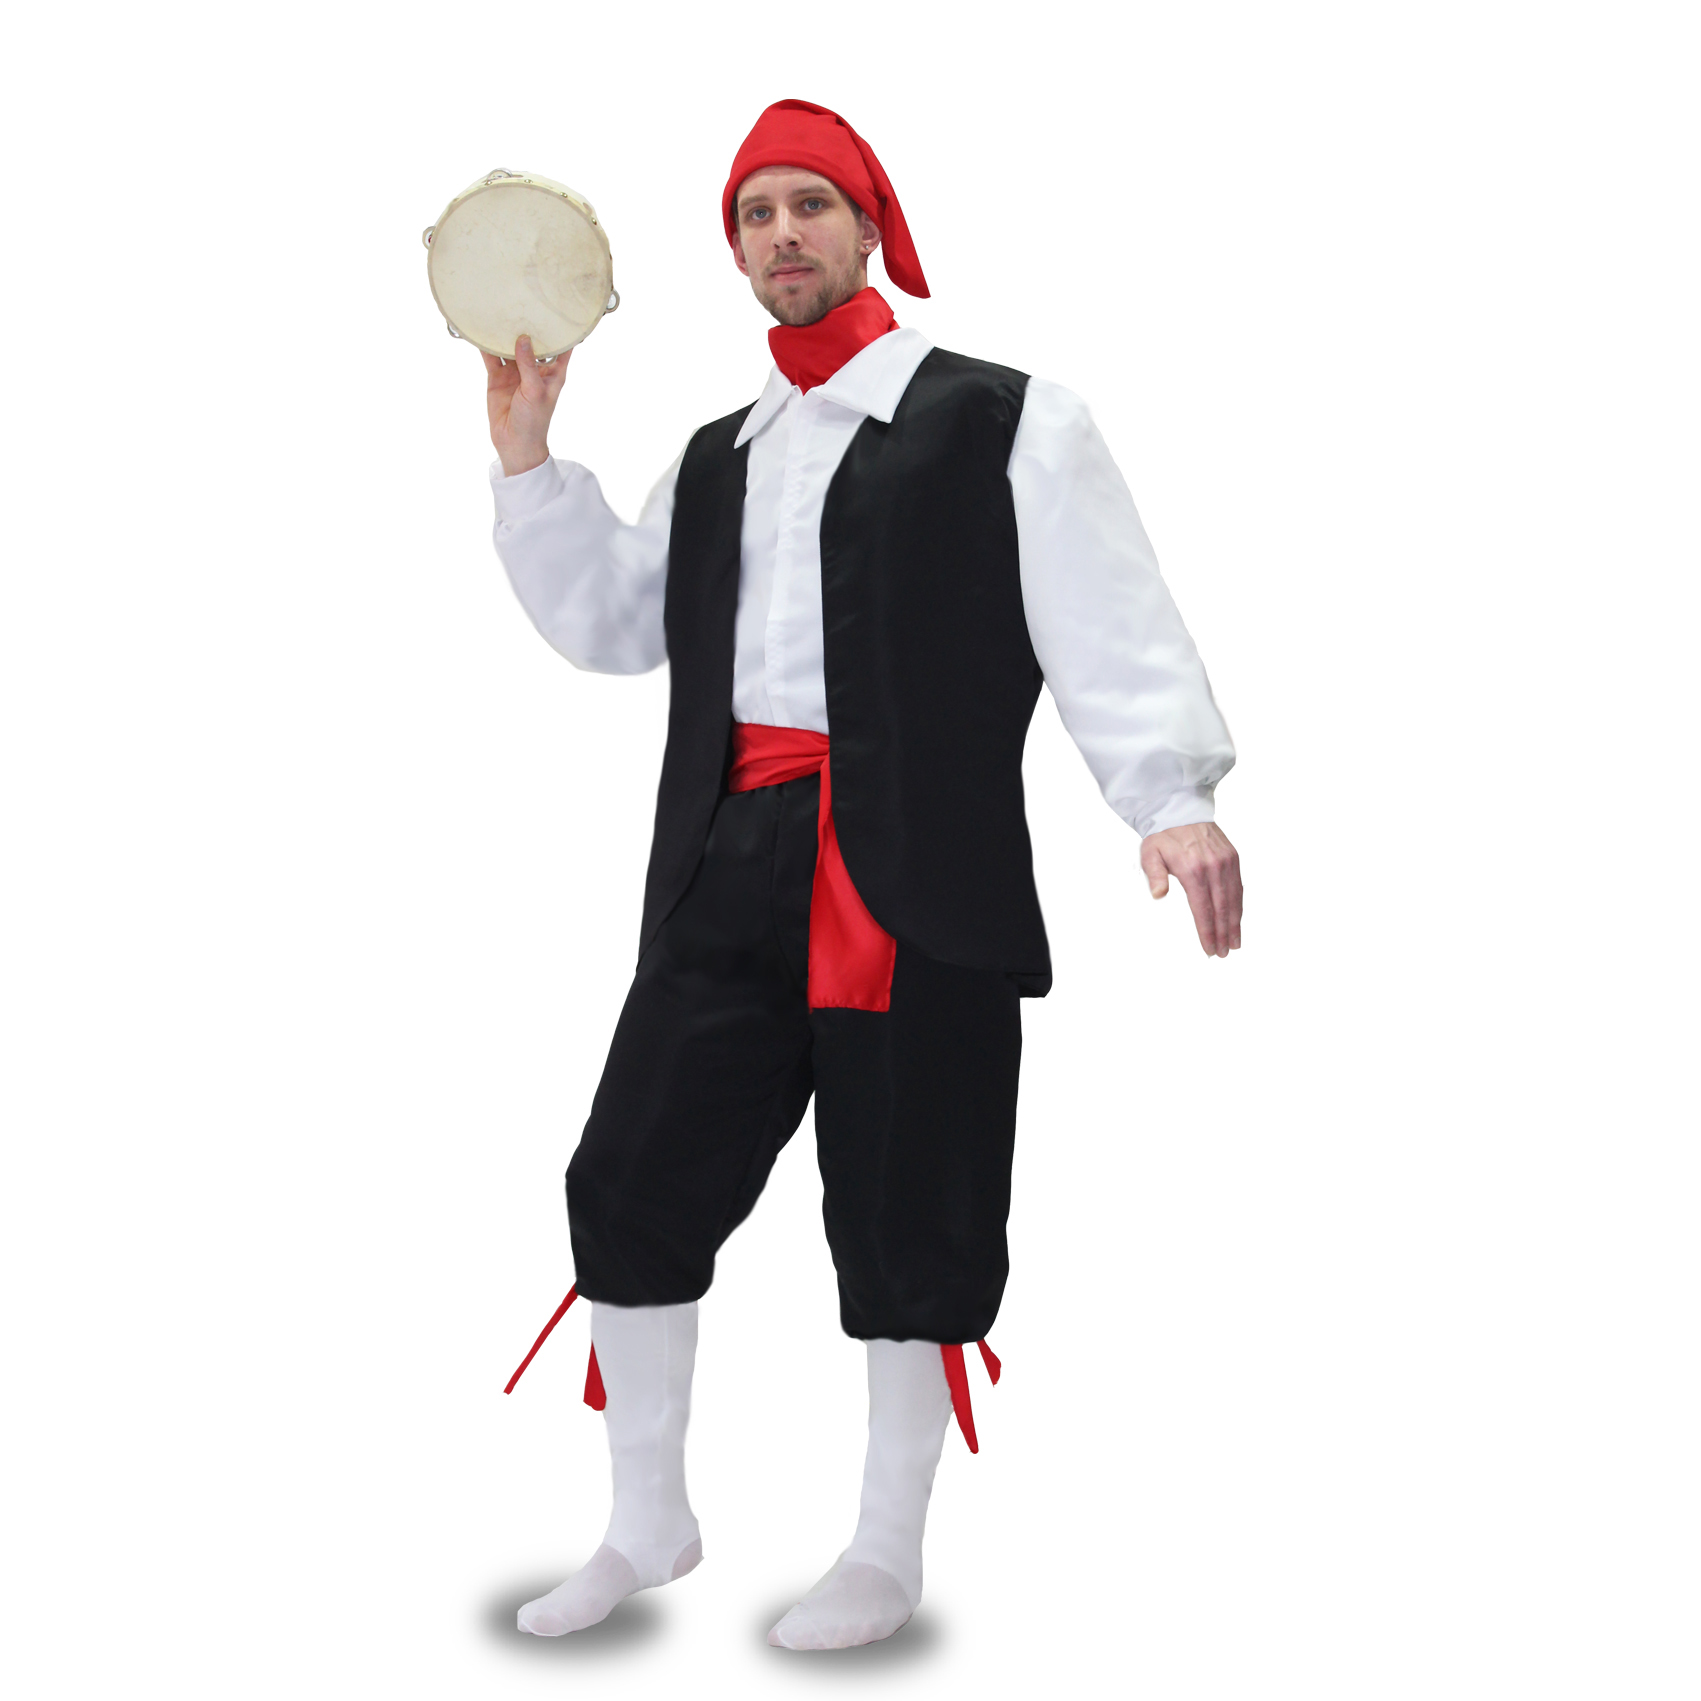 Details About Costume Dress Carnival Mask Adult Tarantella Man Show Original Title